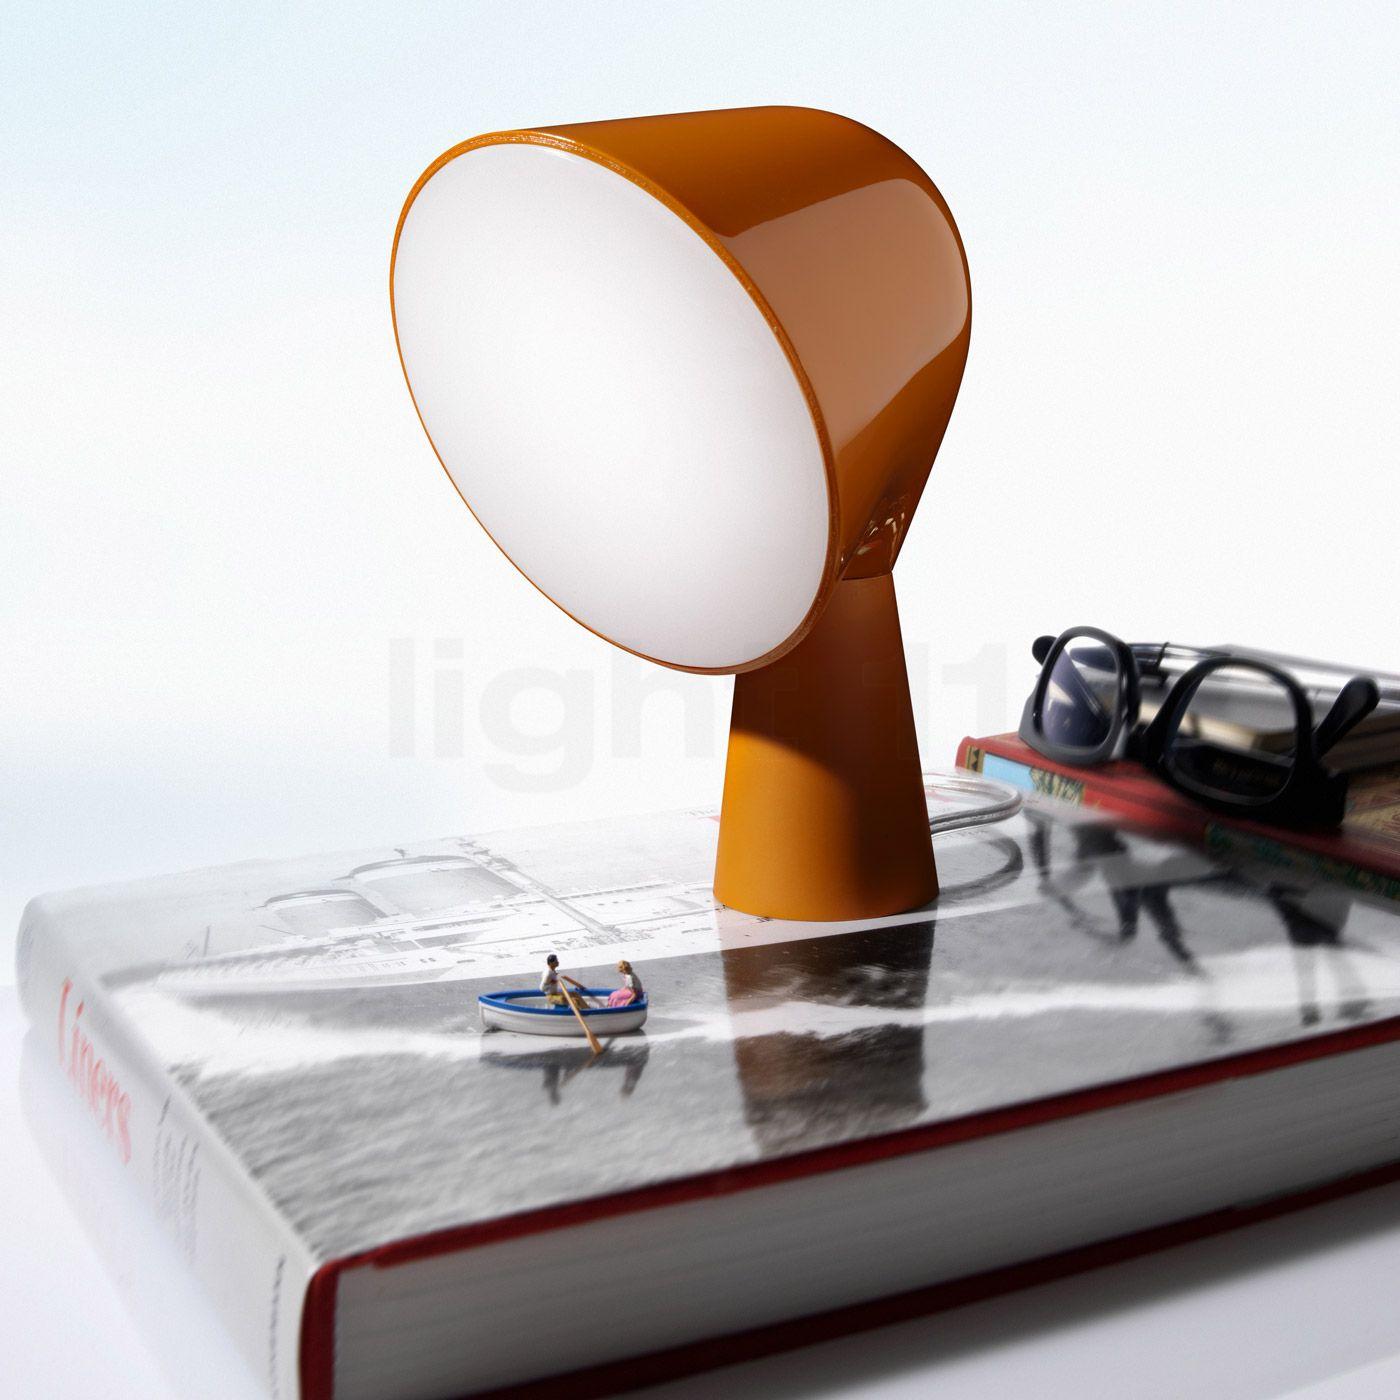 Tavolo Binic Table Foscarini De Lampe QrdWEeCBox